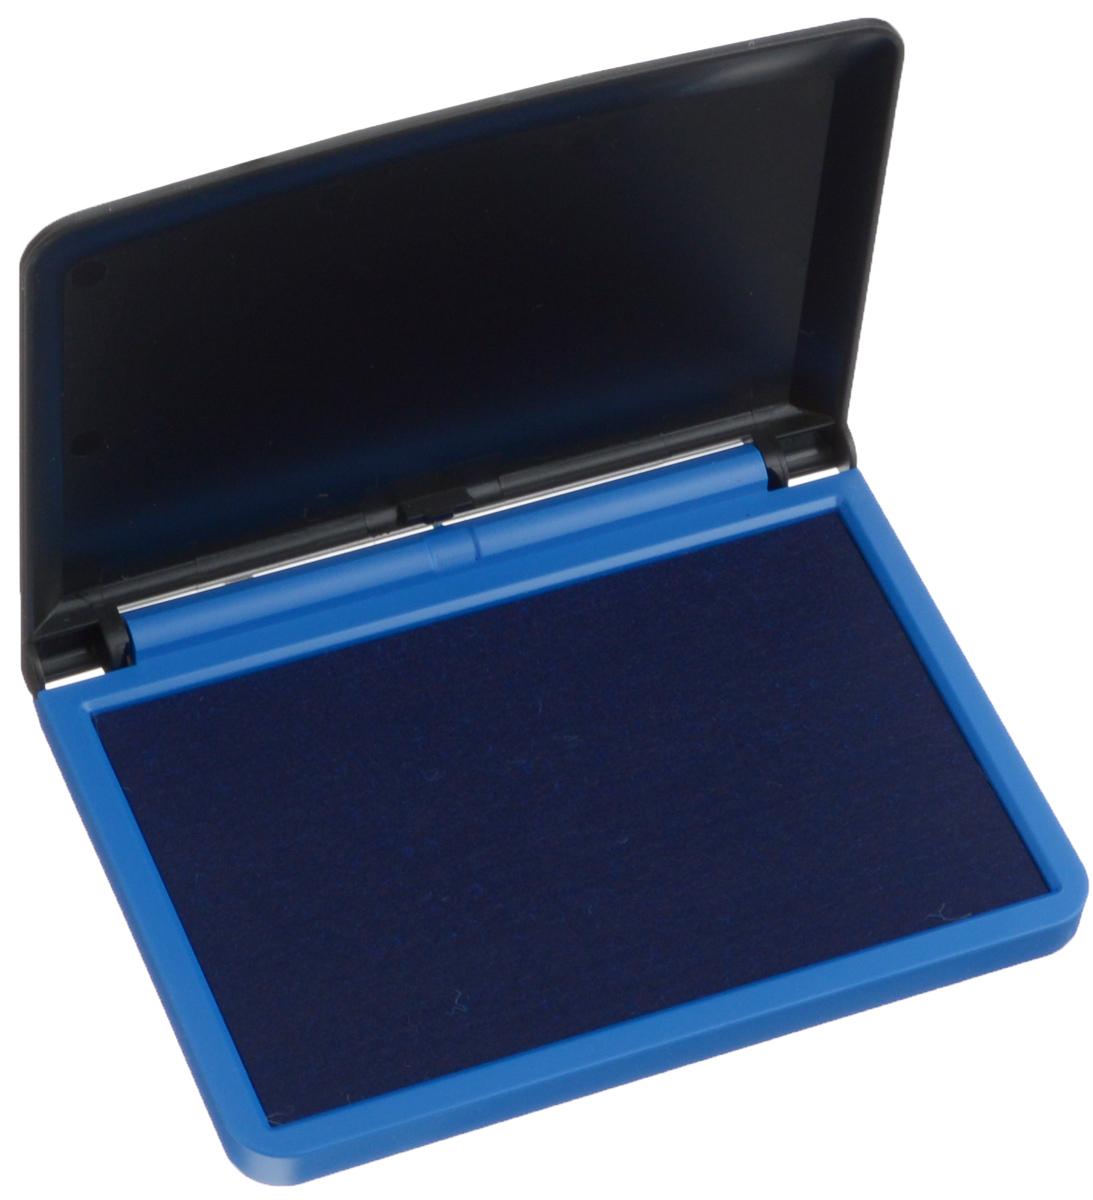 ColopНастольная штемпельная подушка цвет синий 70 х 110 мм Colop